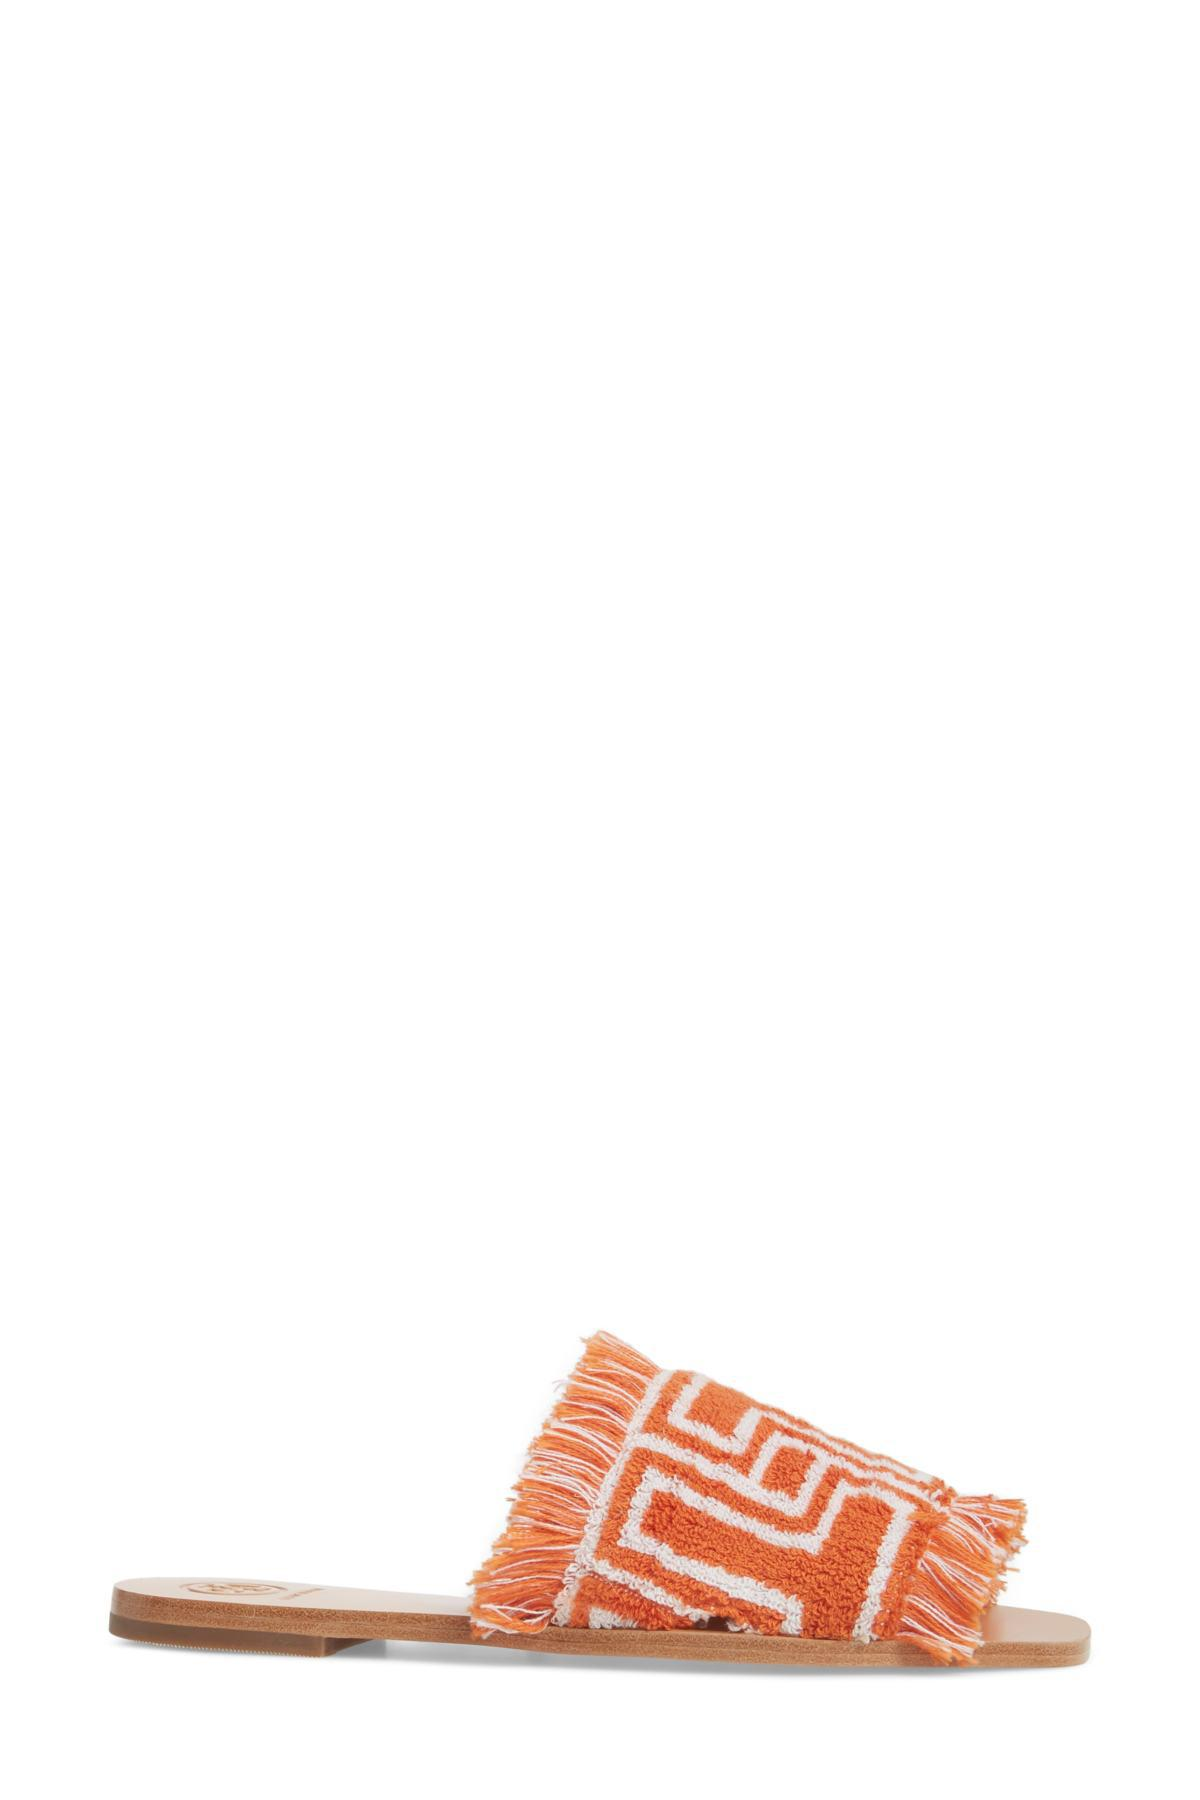 9240a62e57cd Lyst - Tory Burch Logo-intarsia Terry Slides in Orange